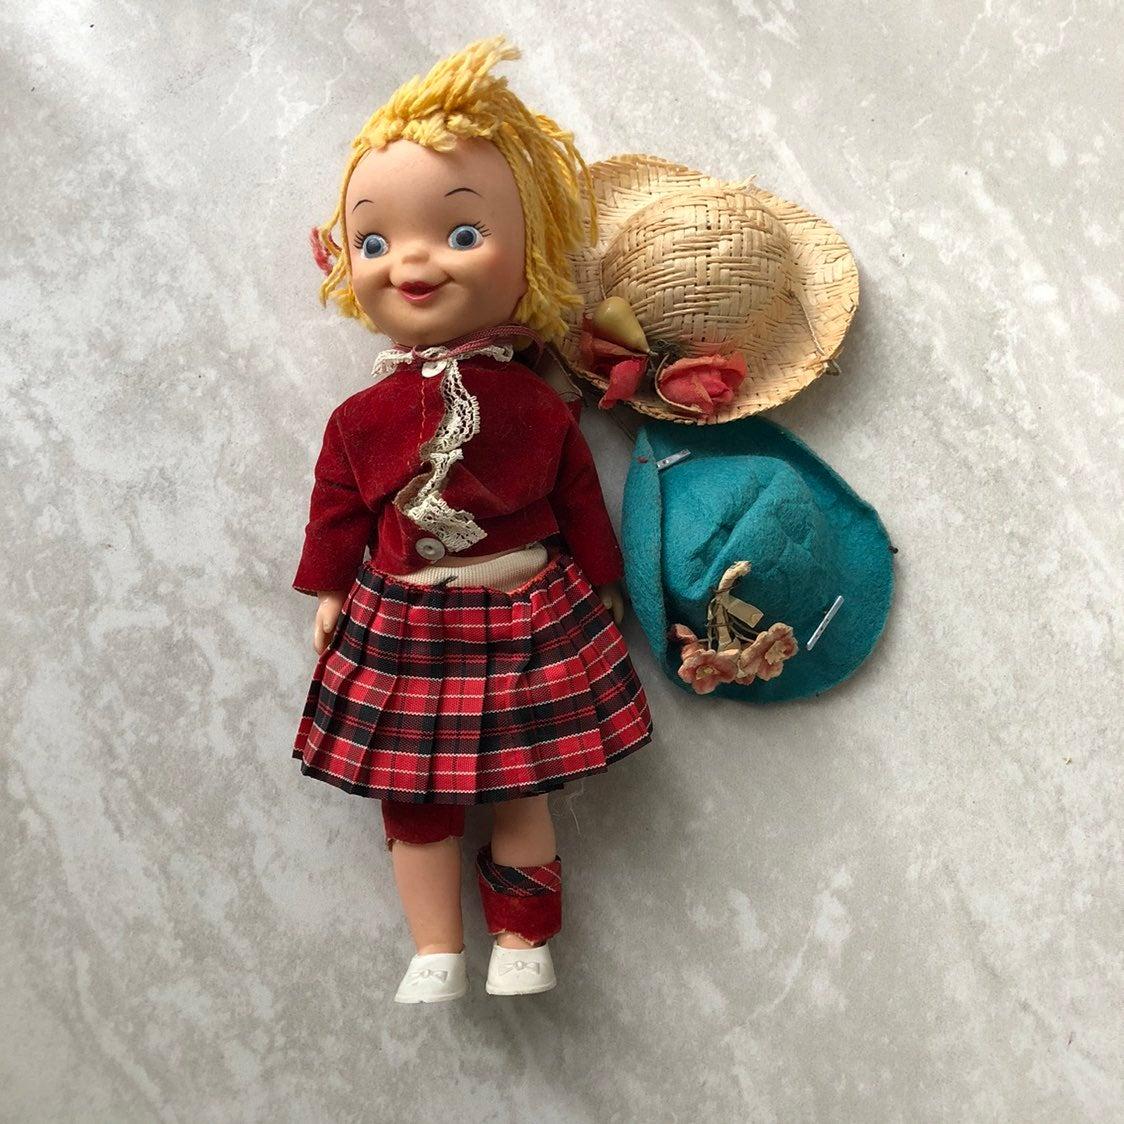 Vintage Disney 1965 Small World Doll